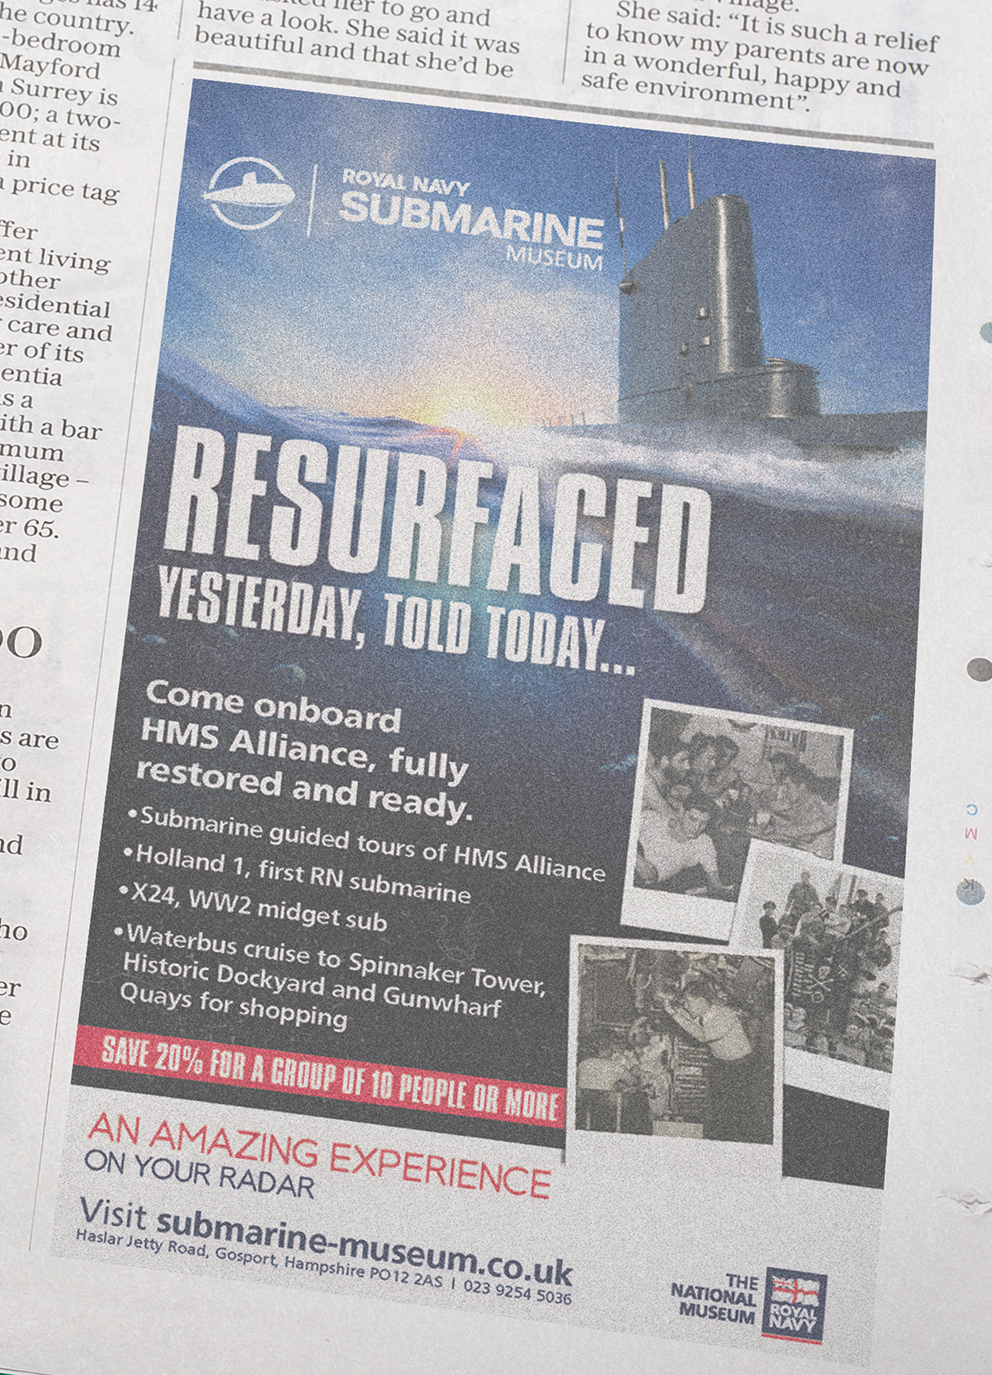 The Royal Navy Submarine Museum Press Advert